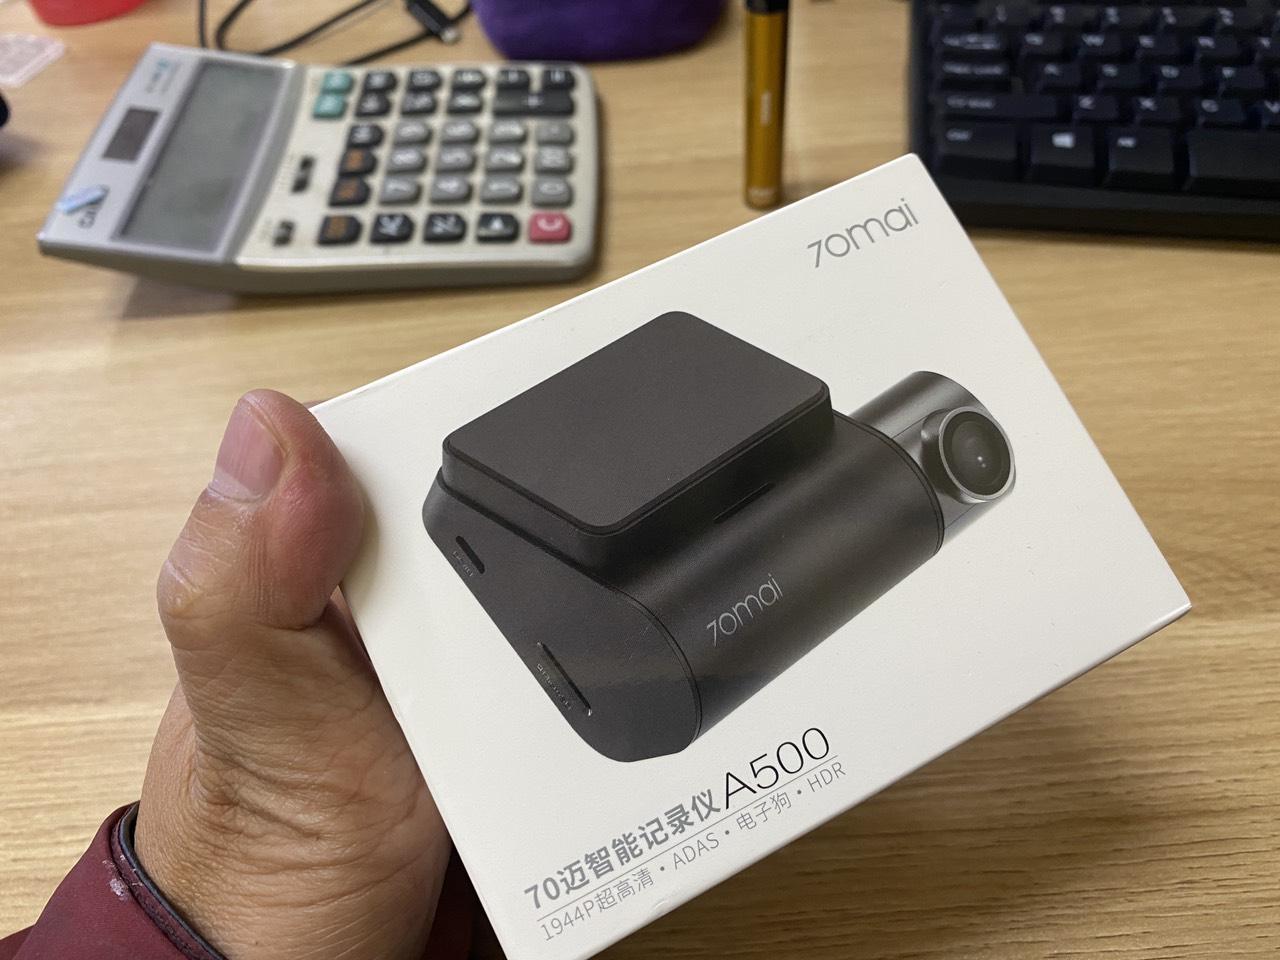 update firmware tieng Anh 70mai A500